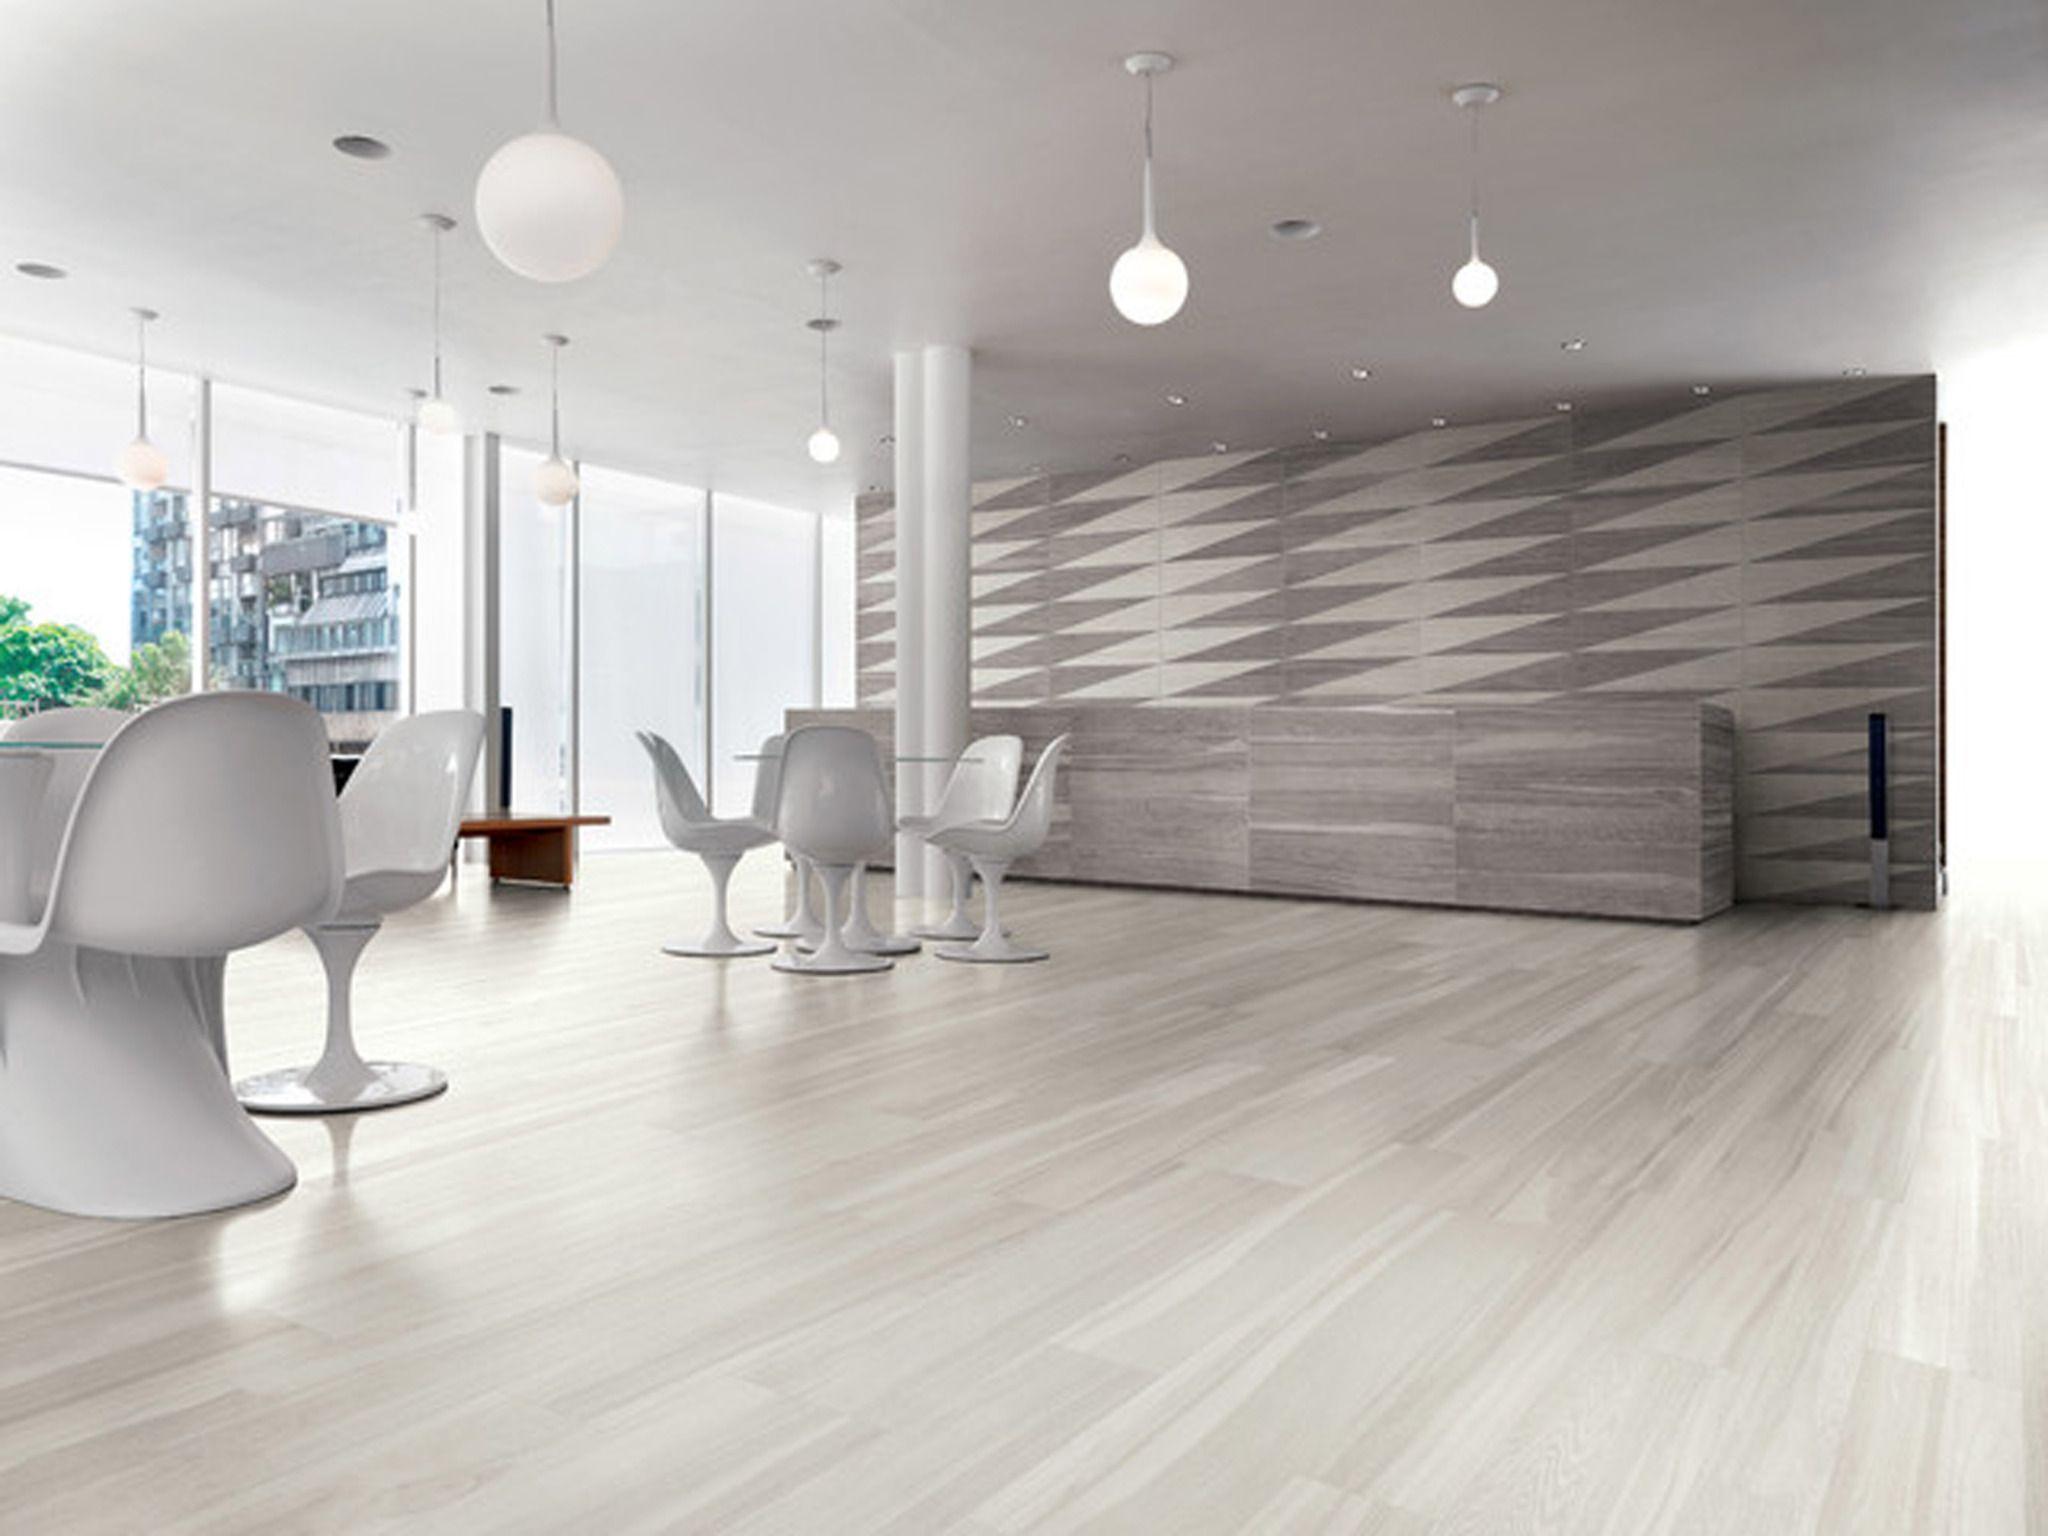 modern floor tile image collections - tile flooring design ideas